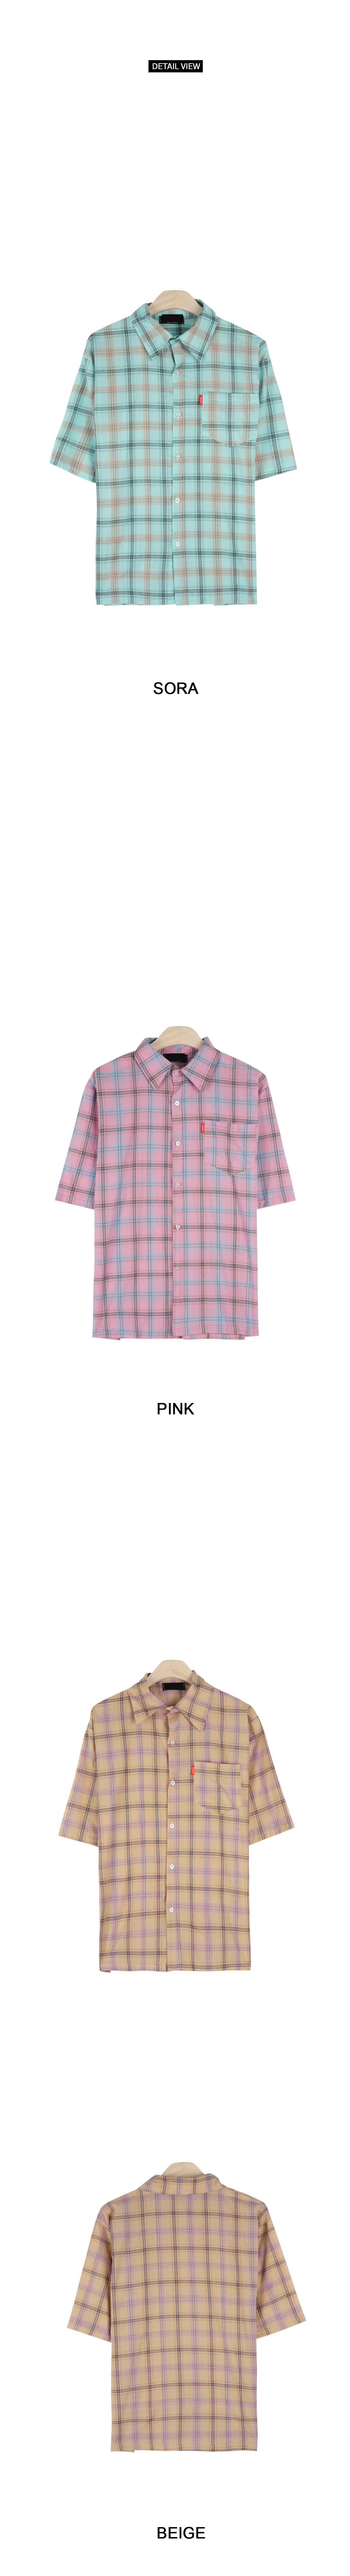 Macaron check short-sleeved shirt